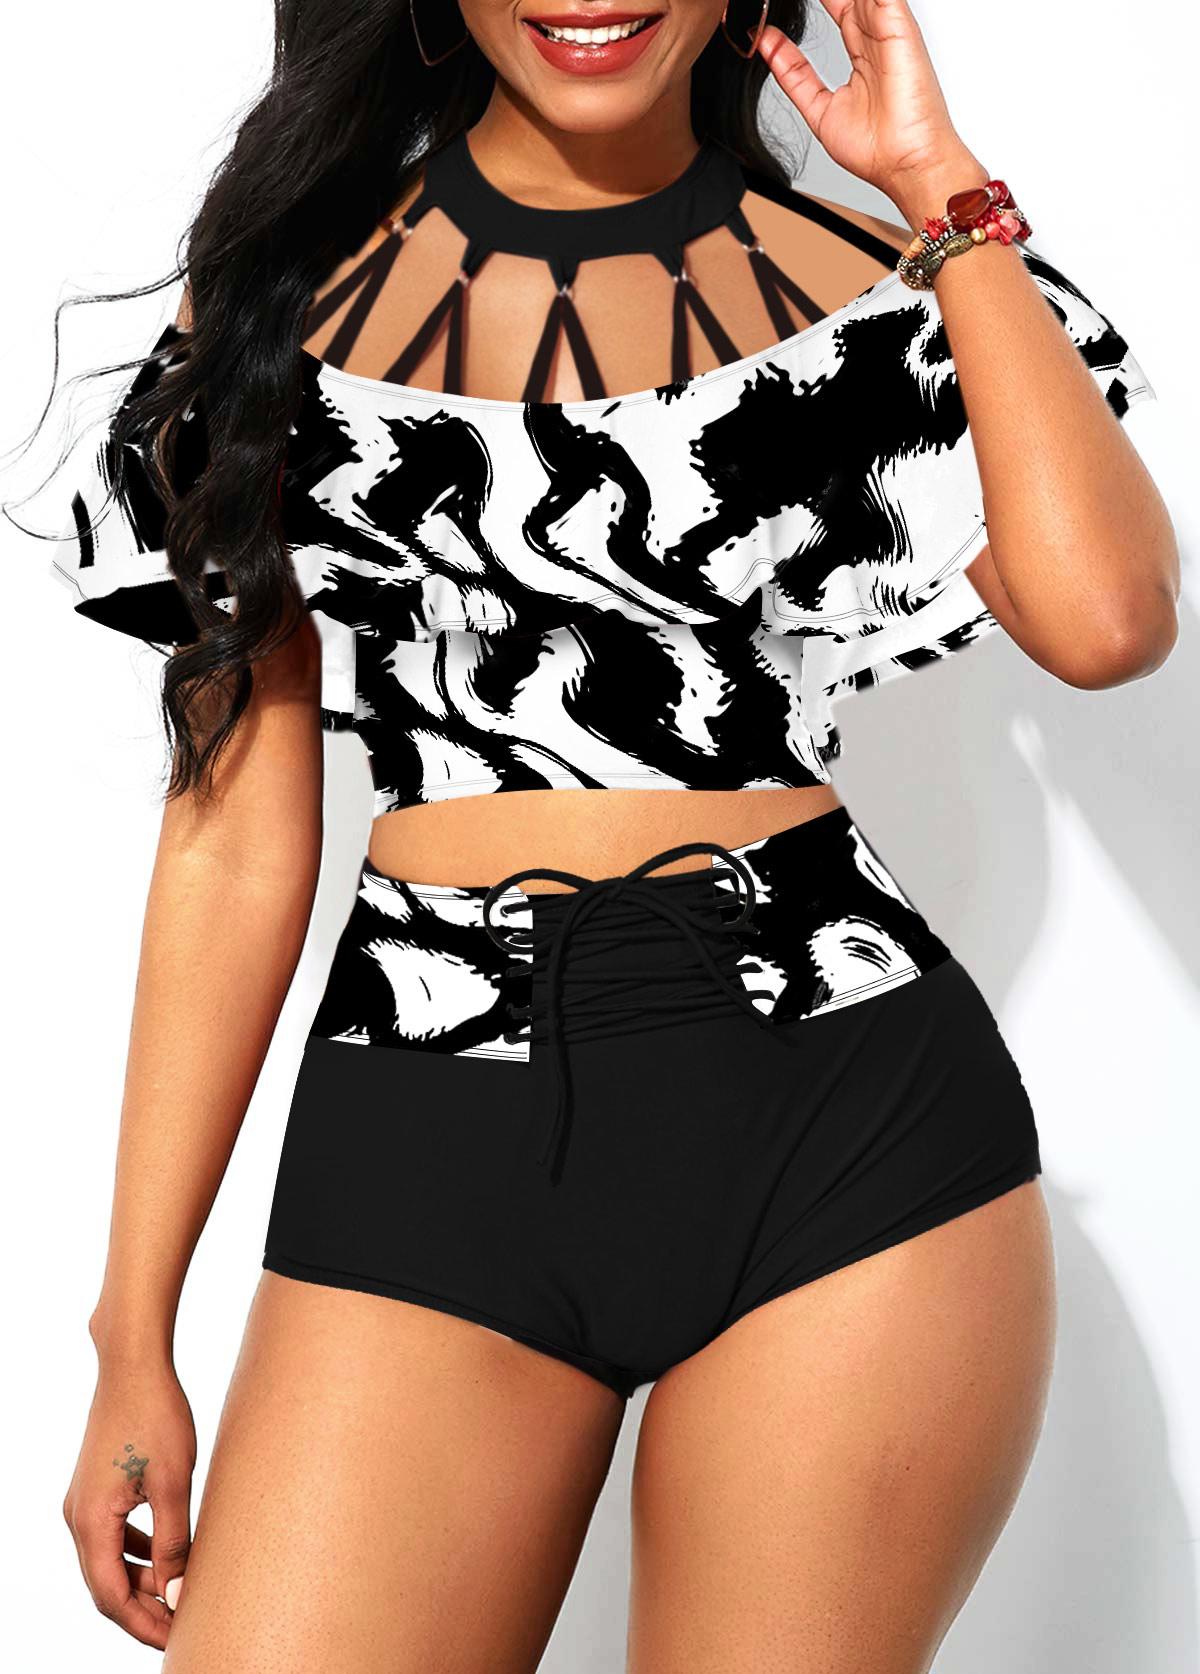 ROTITA Lace Up High Waisted Foldover Front Bikini Set